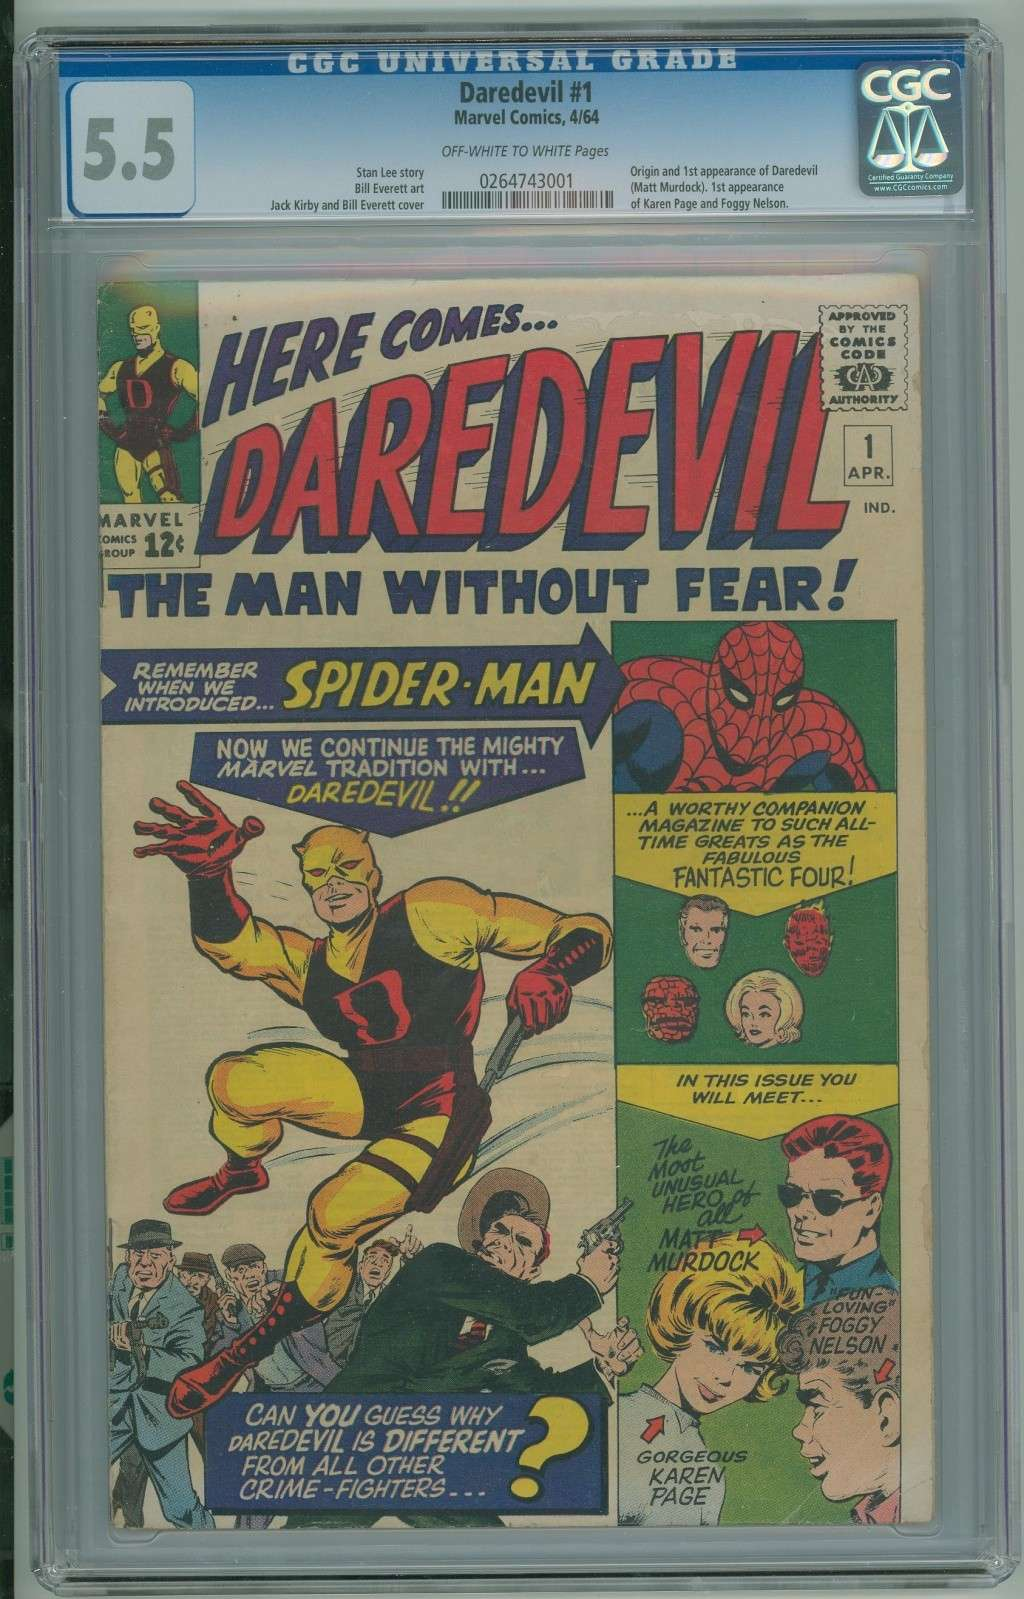 Anybody collect comic books here? Darede10